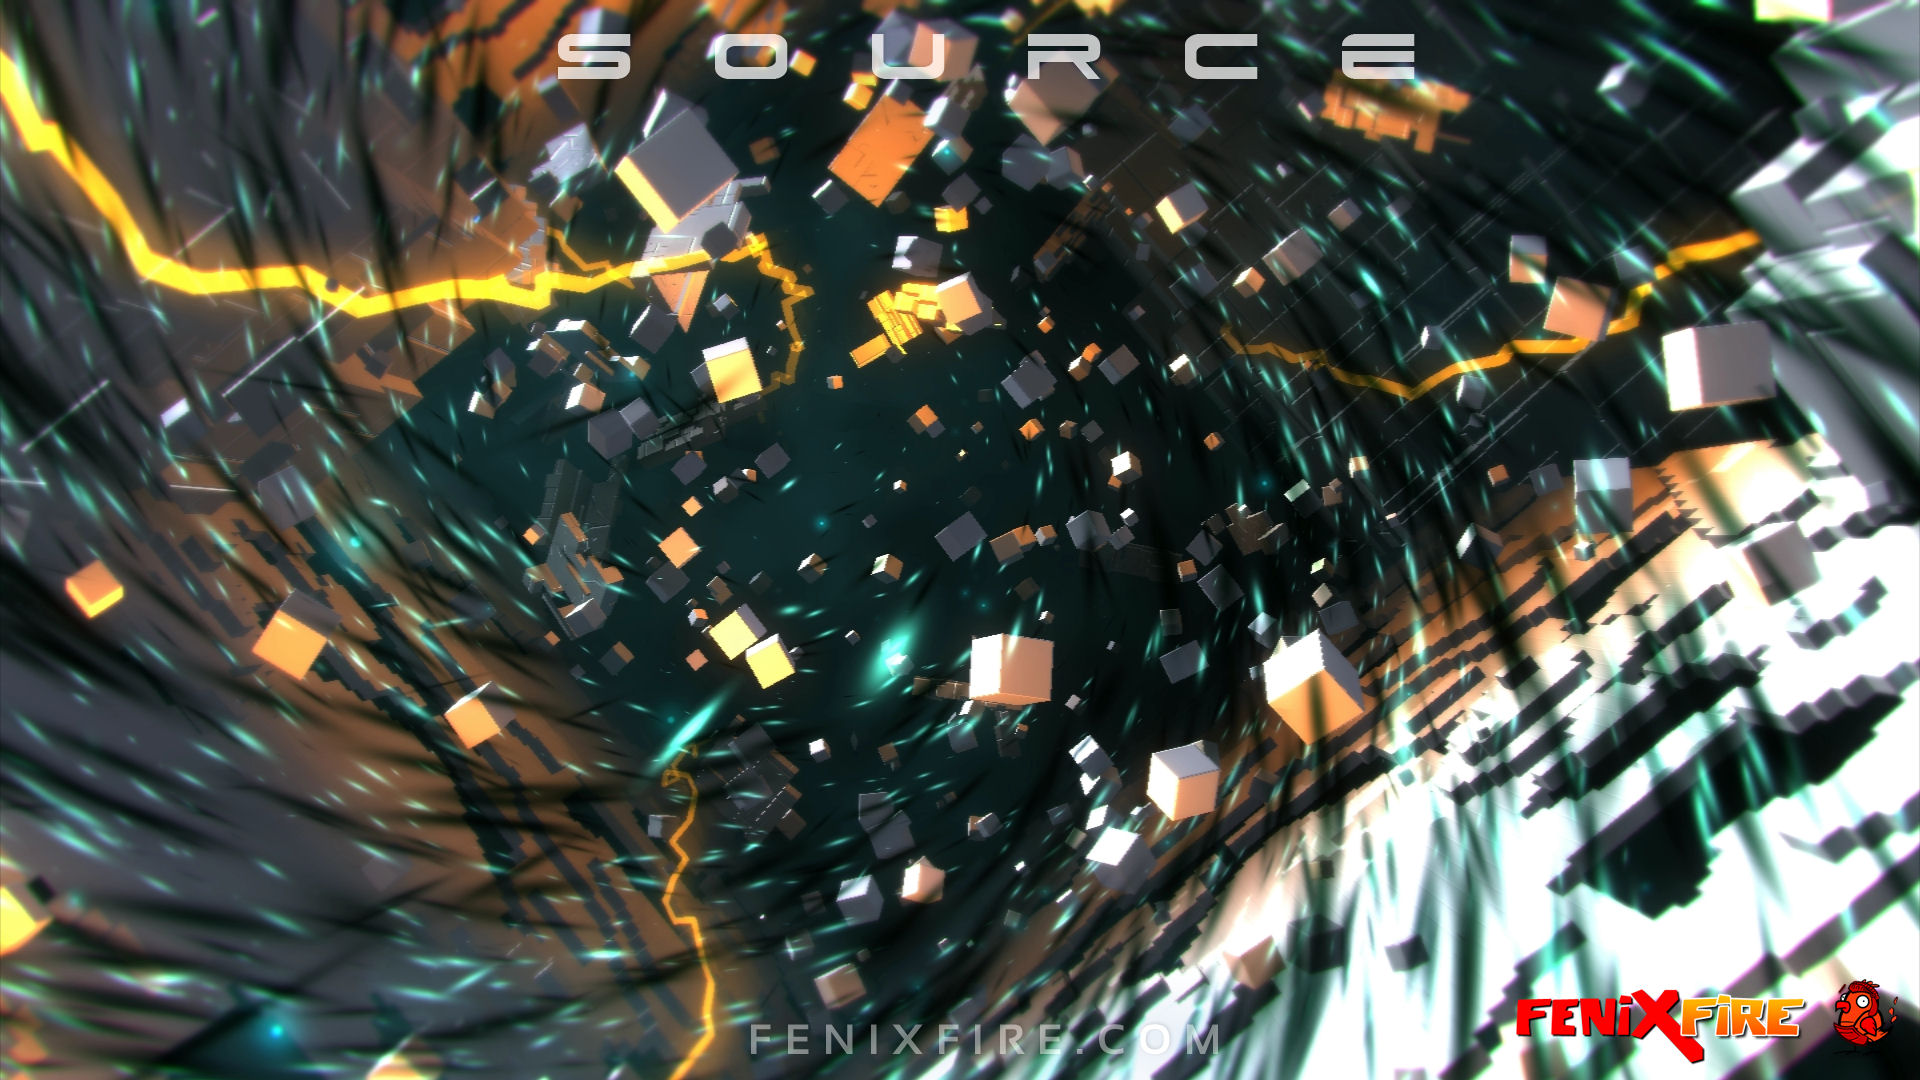 Fenix Fire launches Kickstarter campaign for arcade adventure Source